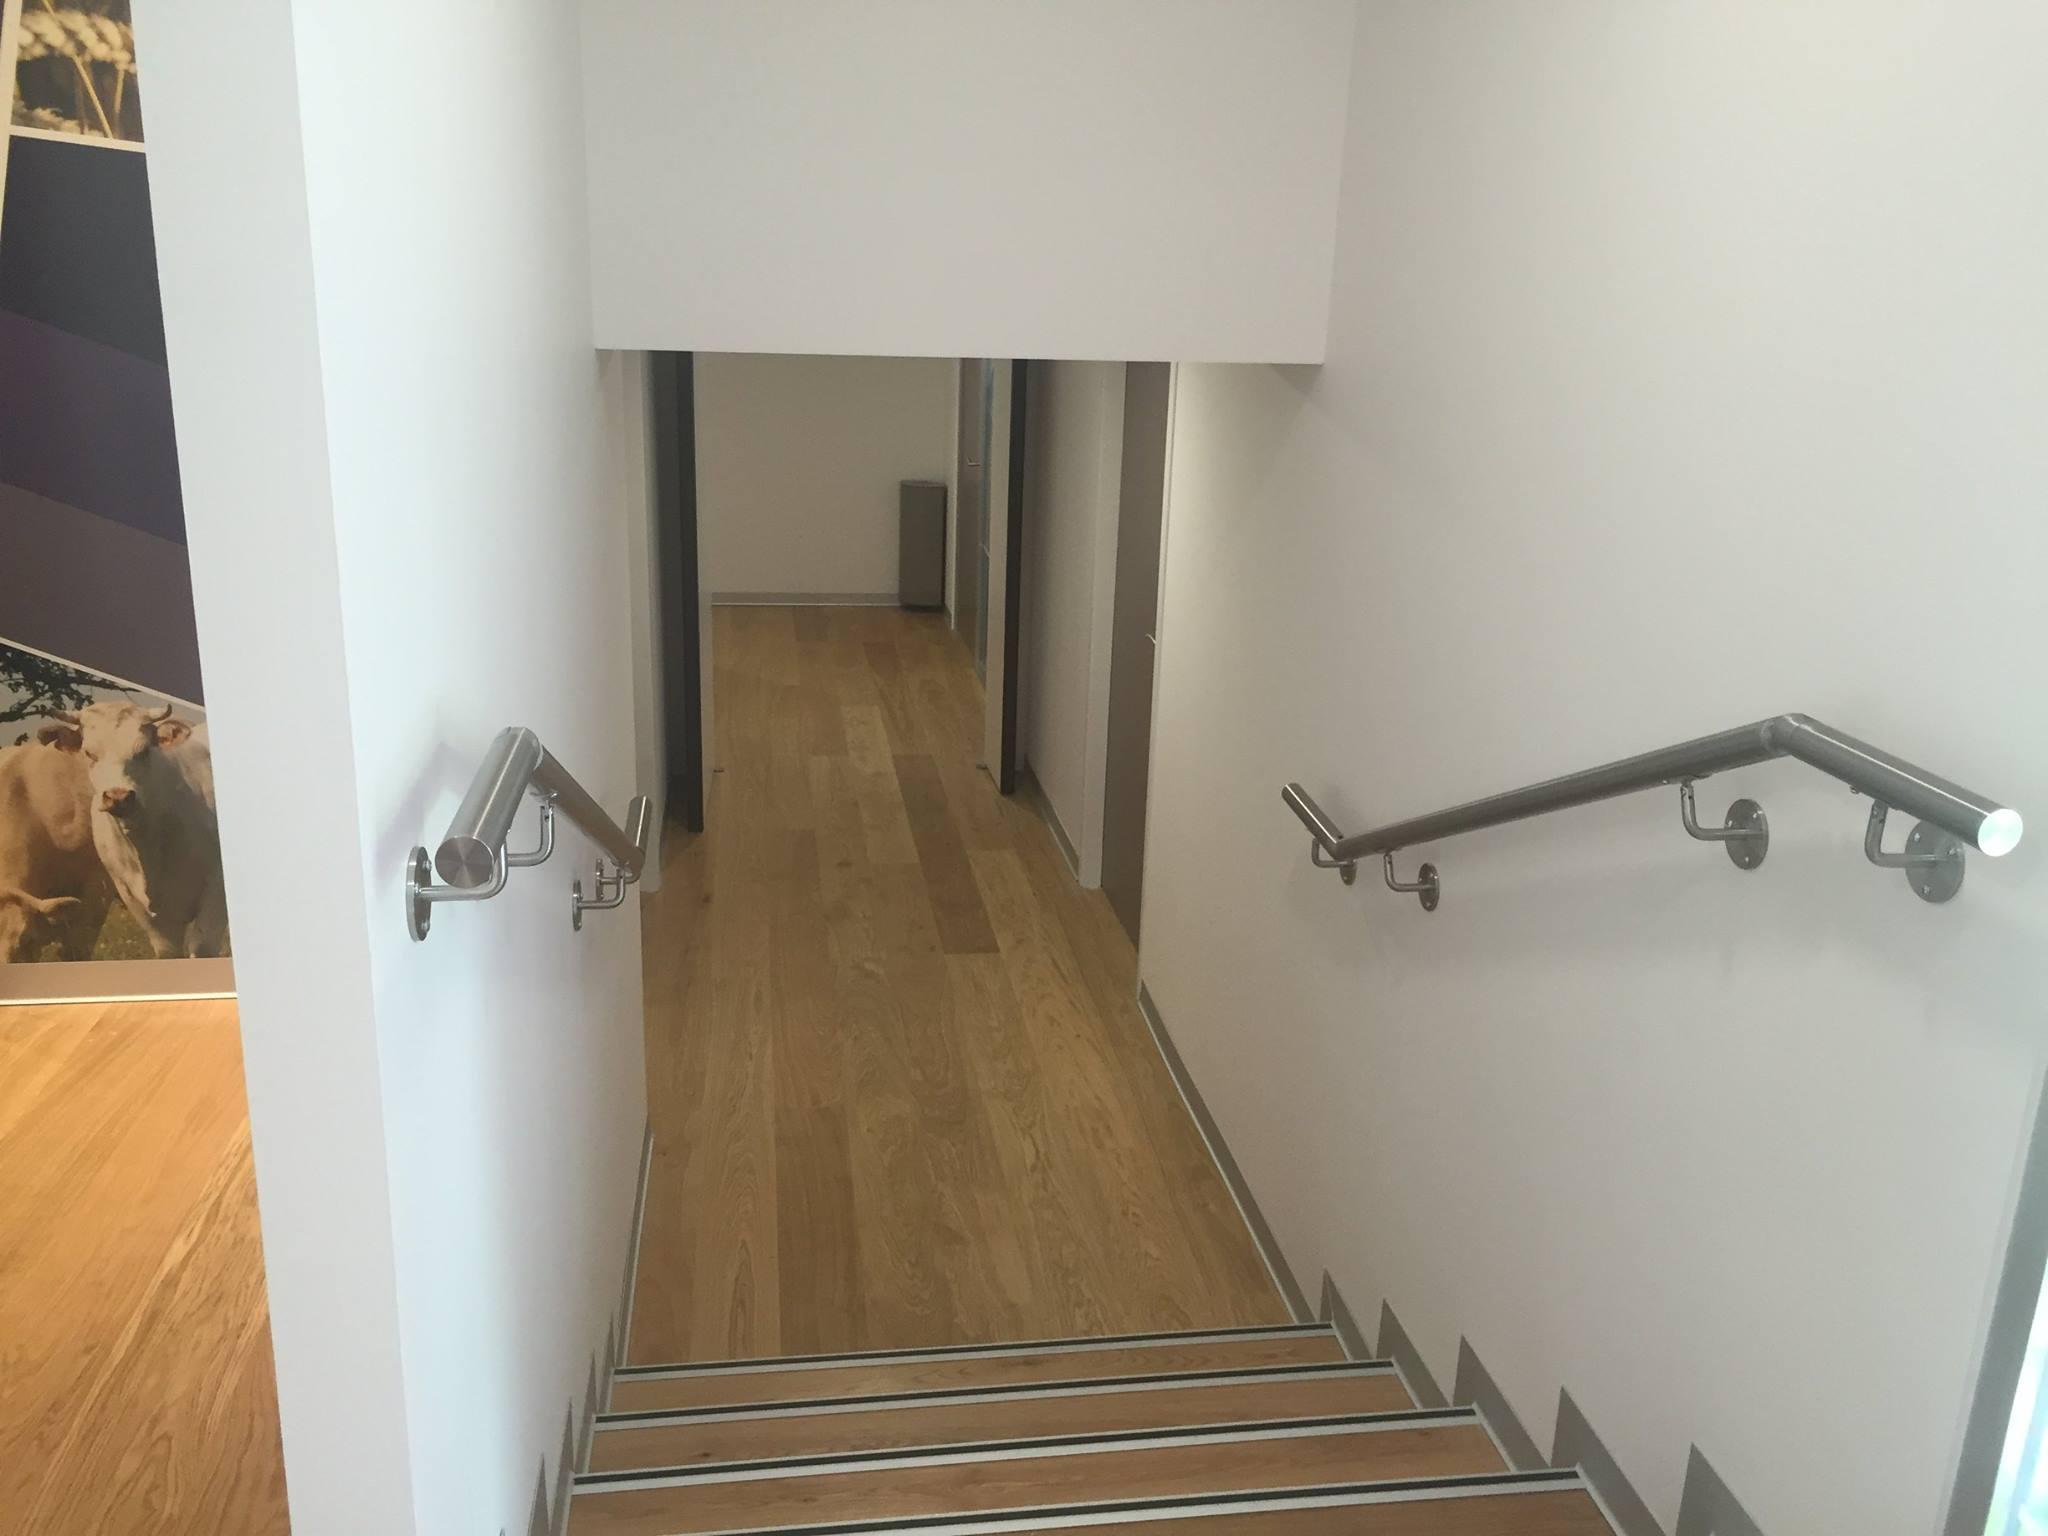 Main courante inox - Plaf'déco spécialiste de l'isolation, plafond suspendu, platrerie, menuiseries, dressing, placards